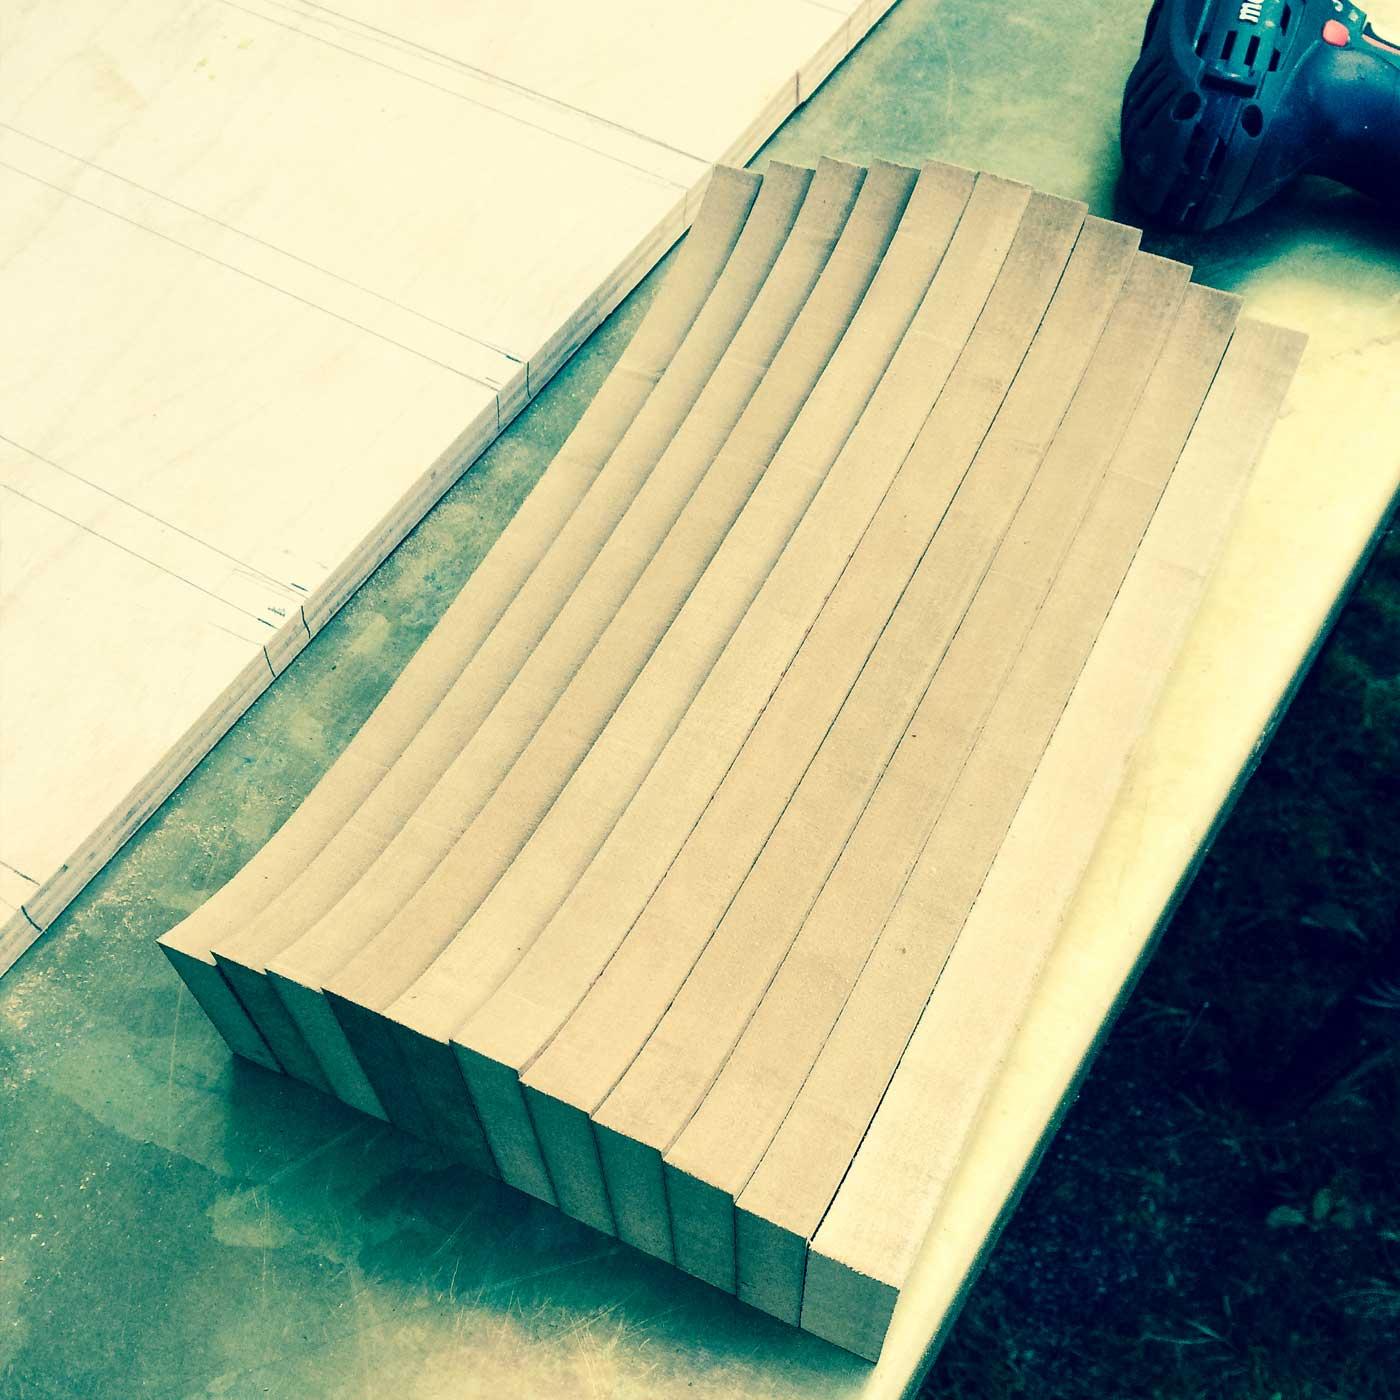 Pieces for the WACH designstudio longboard mold